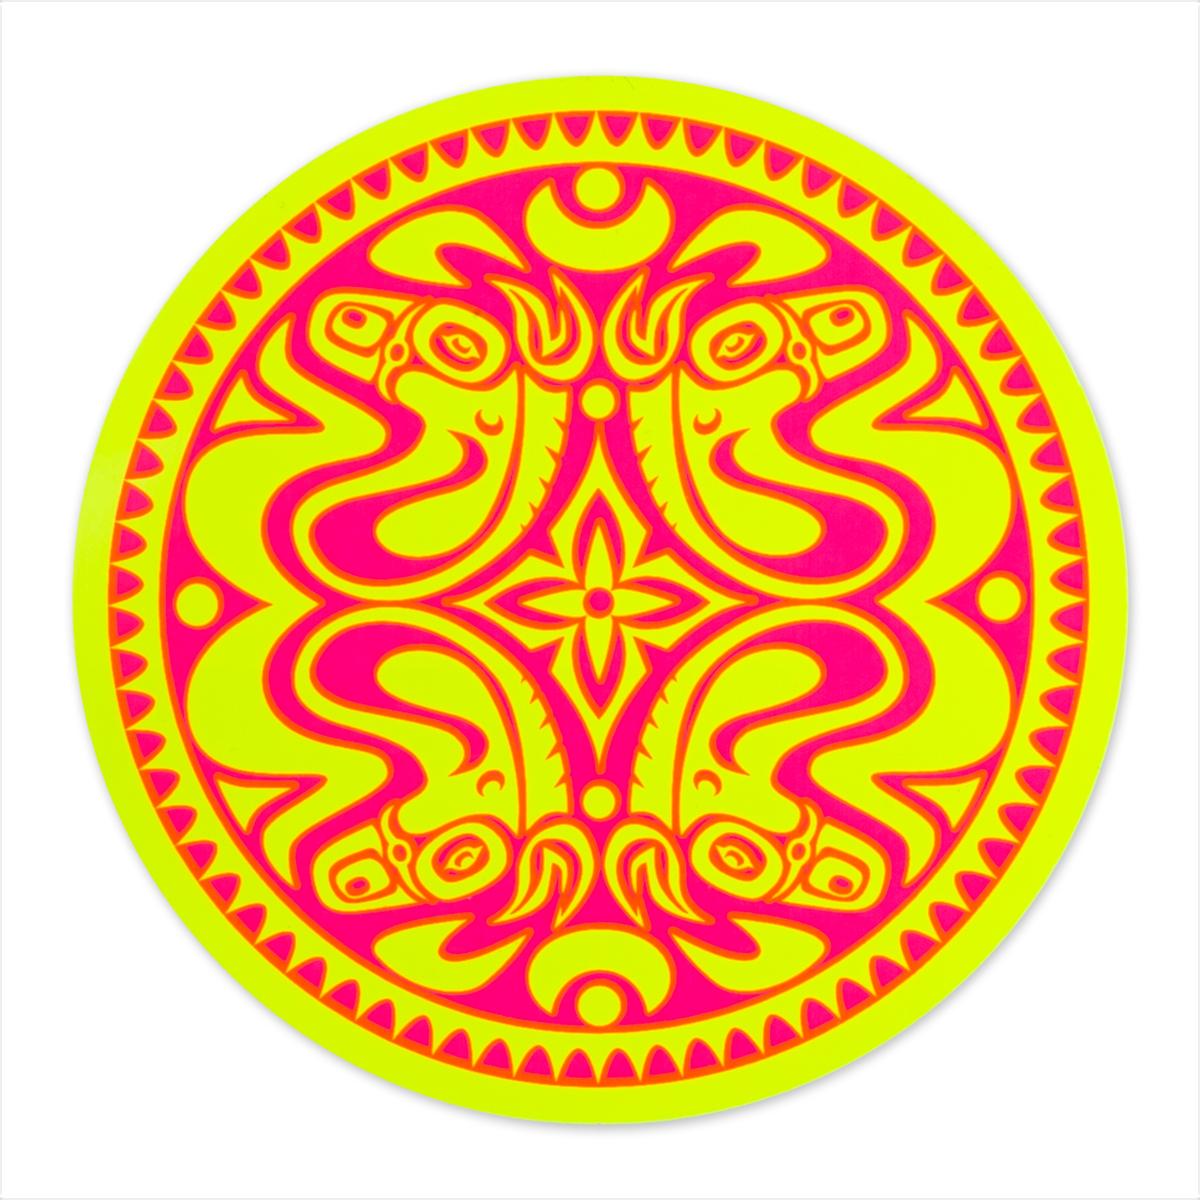 Neon Yellow & Pink Sticker